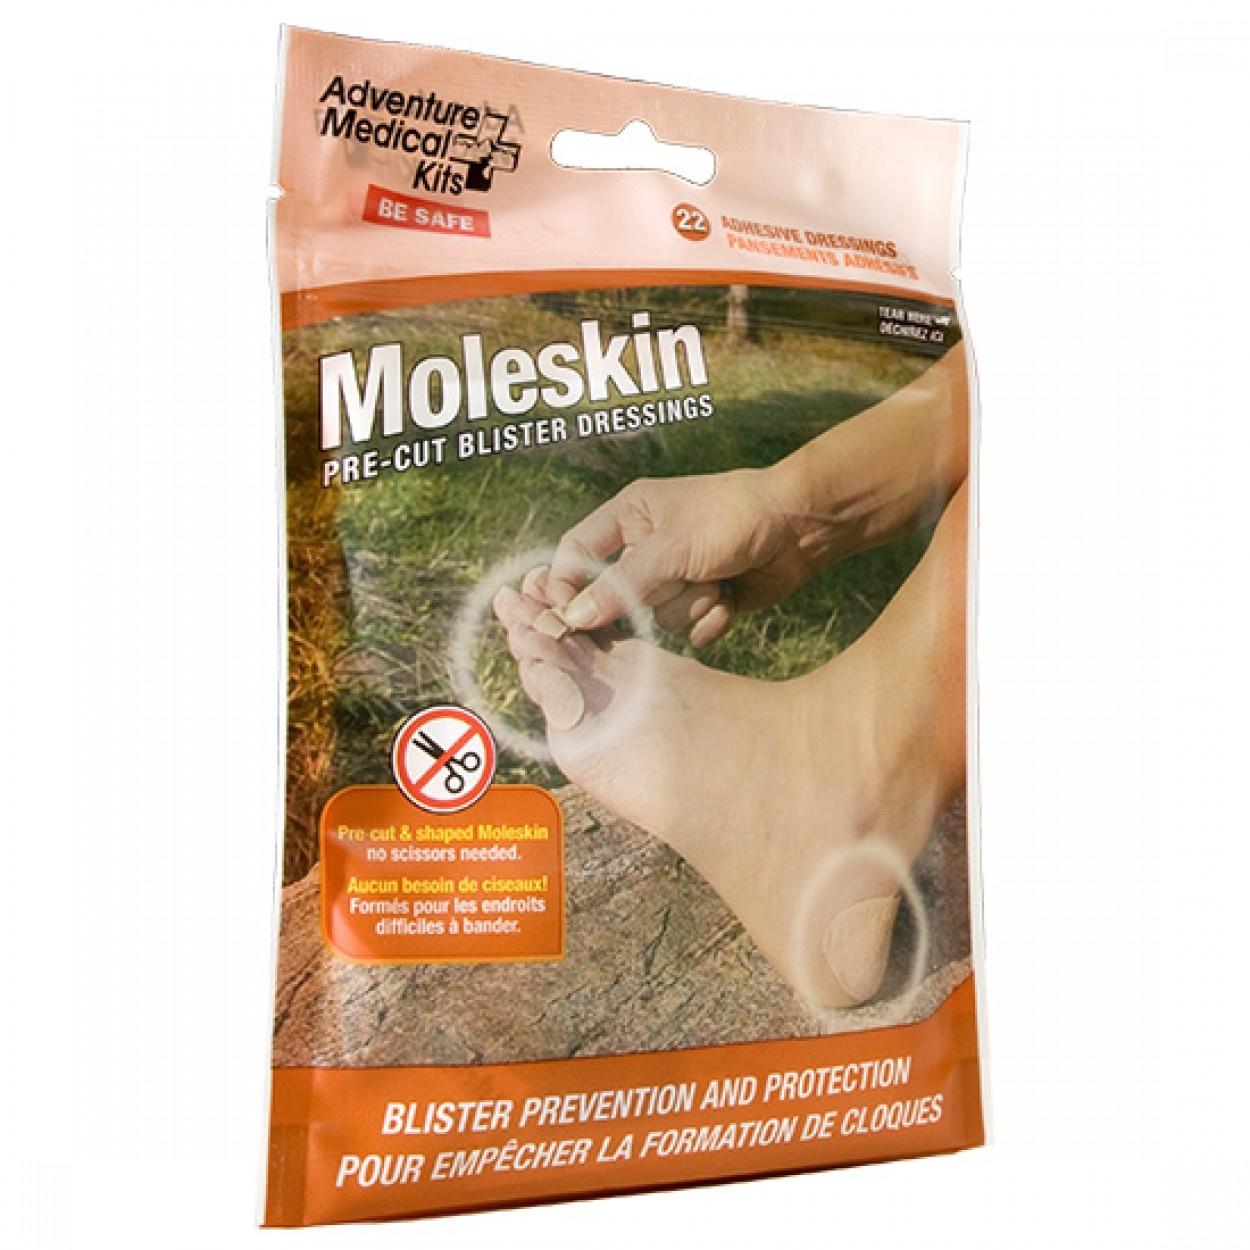 Adventure Medical Kits Moleskin